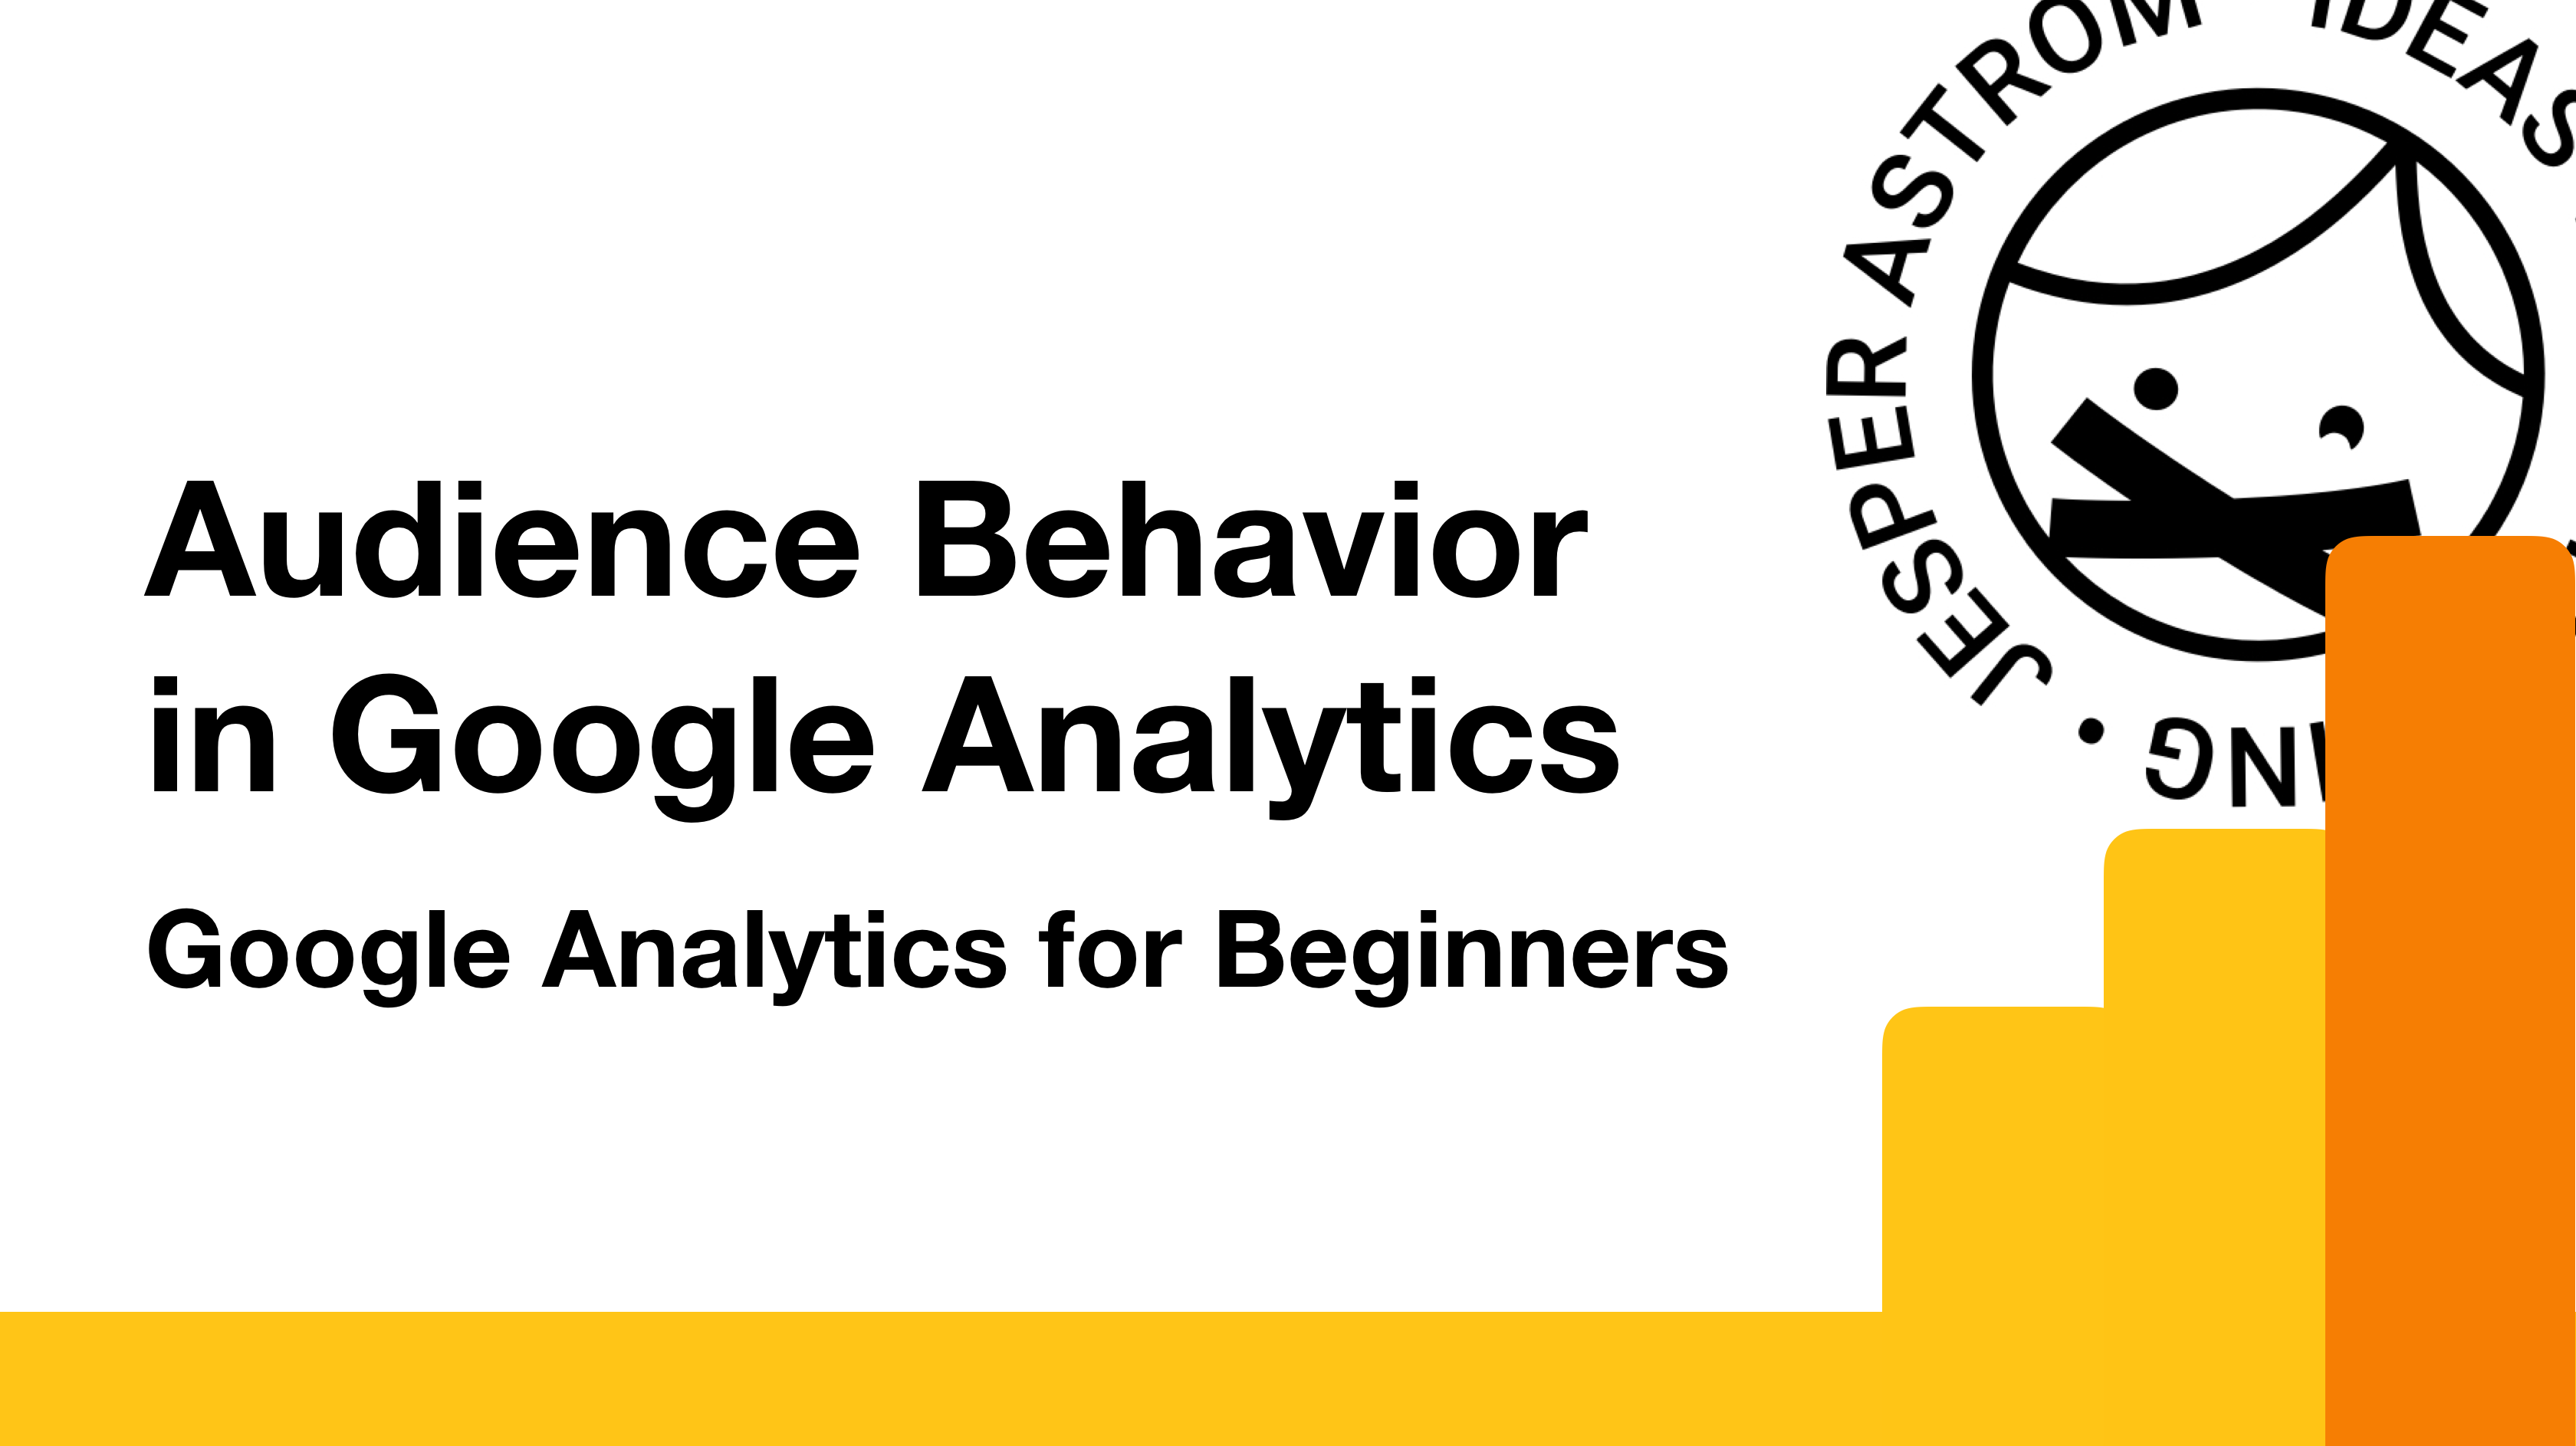 Audience Behavior in Google Analytics